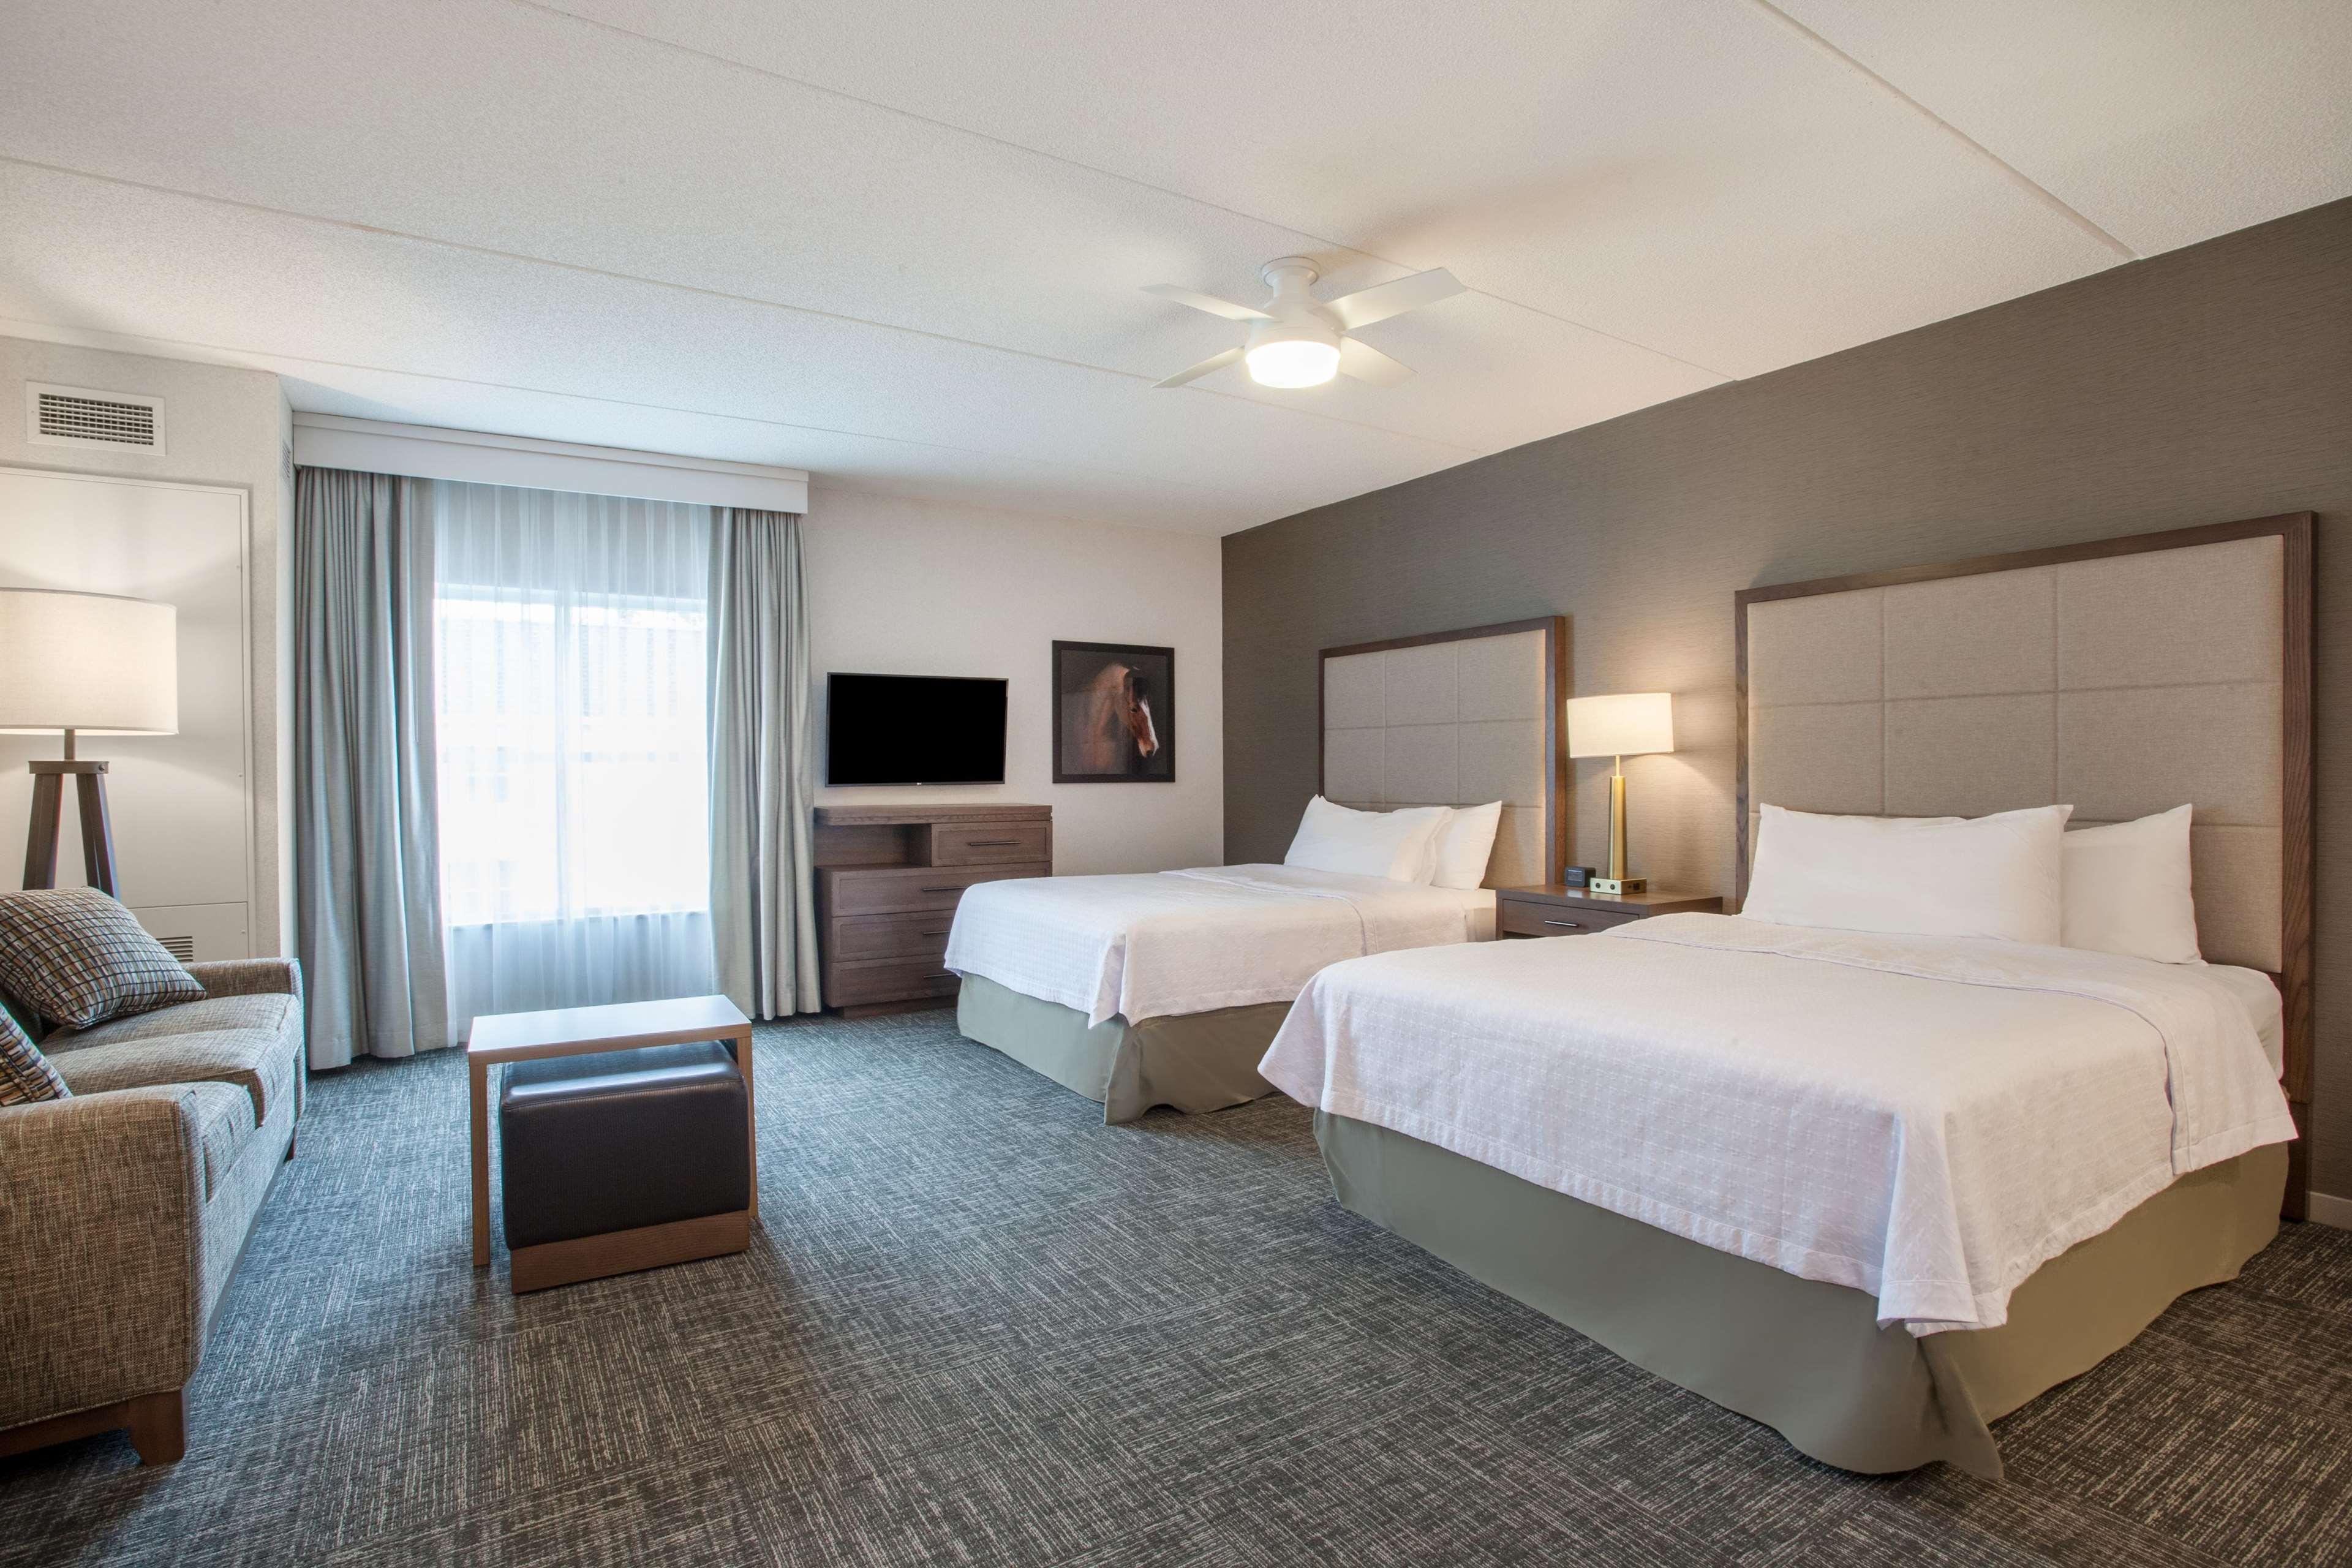 Homewood Suites by Hilton Saratoga Springs image 33